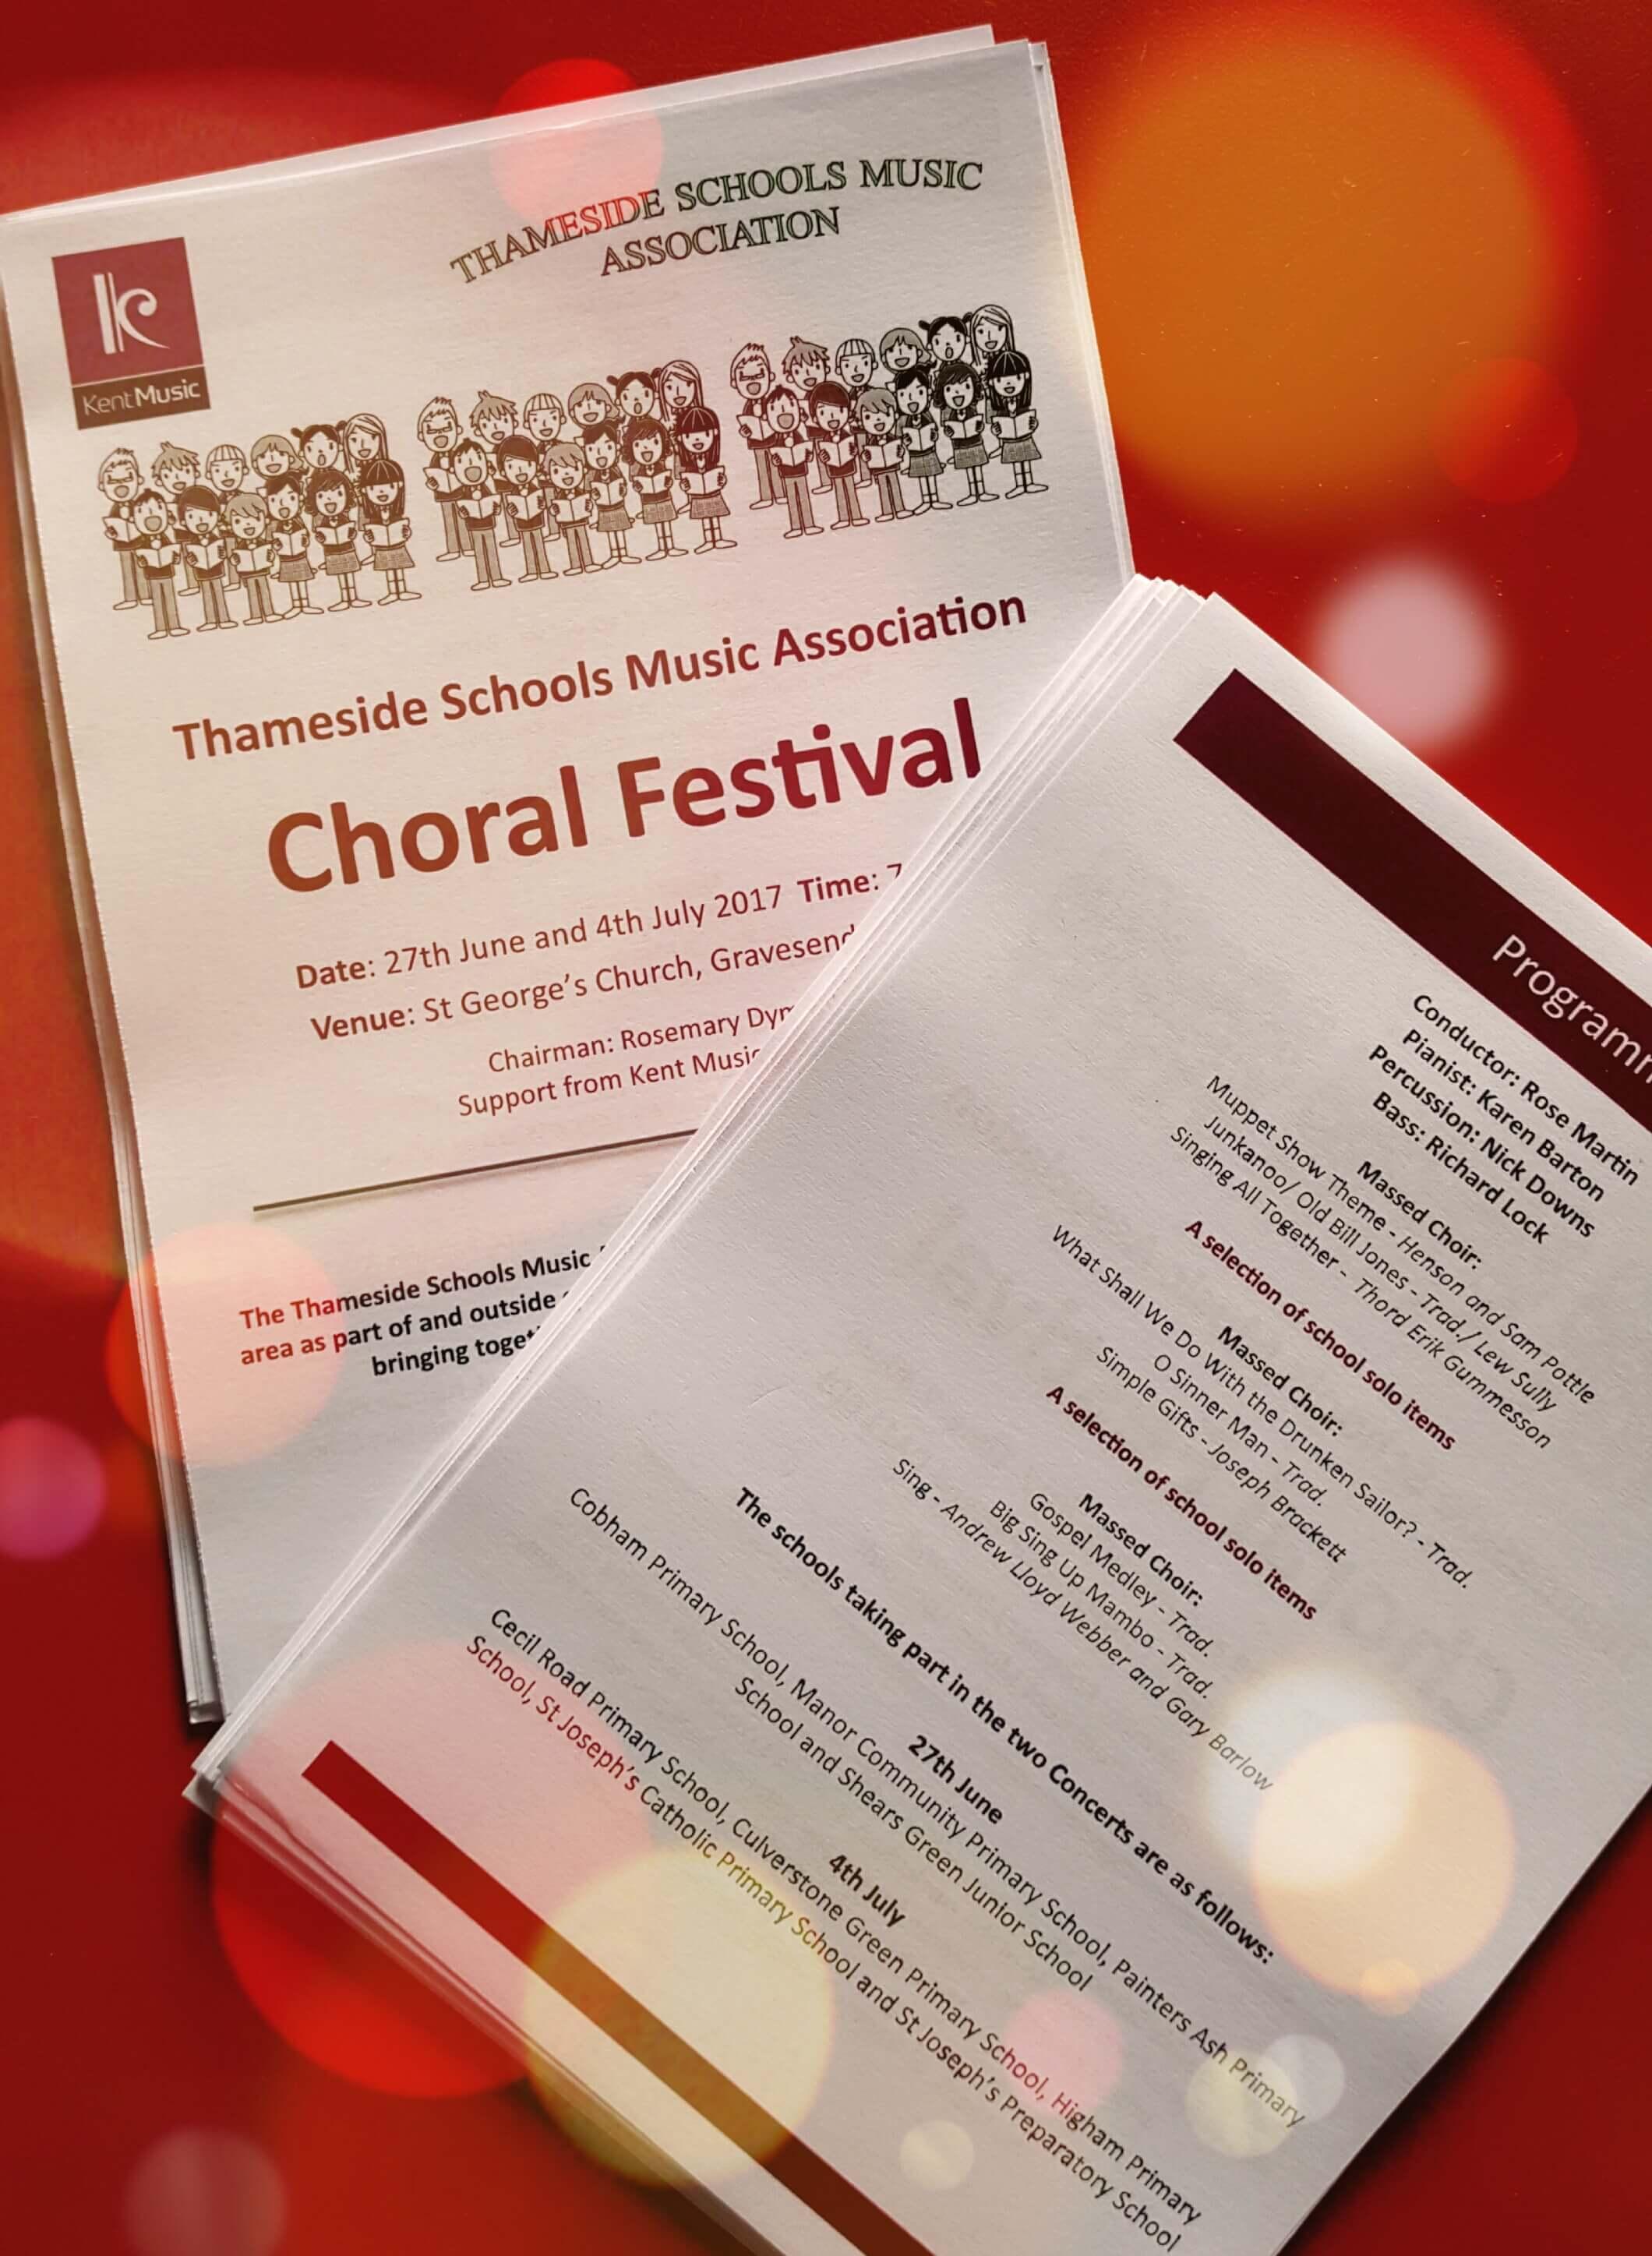 Thameside Schools Music Association Choral Festival